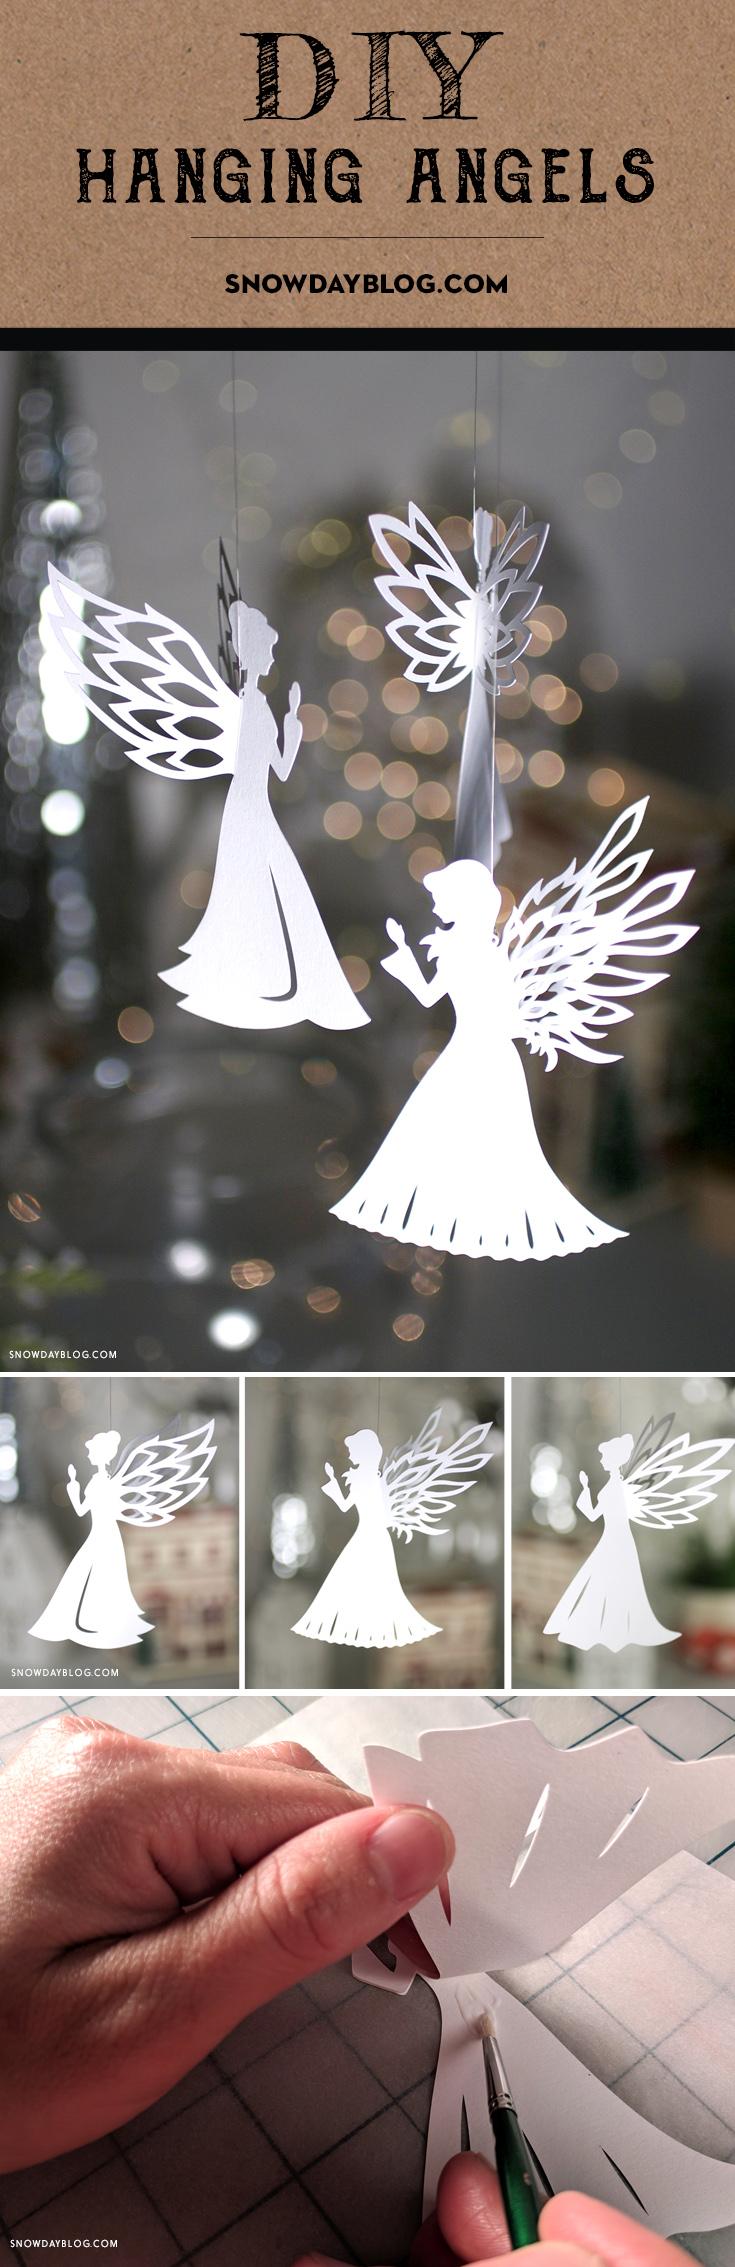 DIY Hanging Angels 2